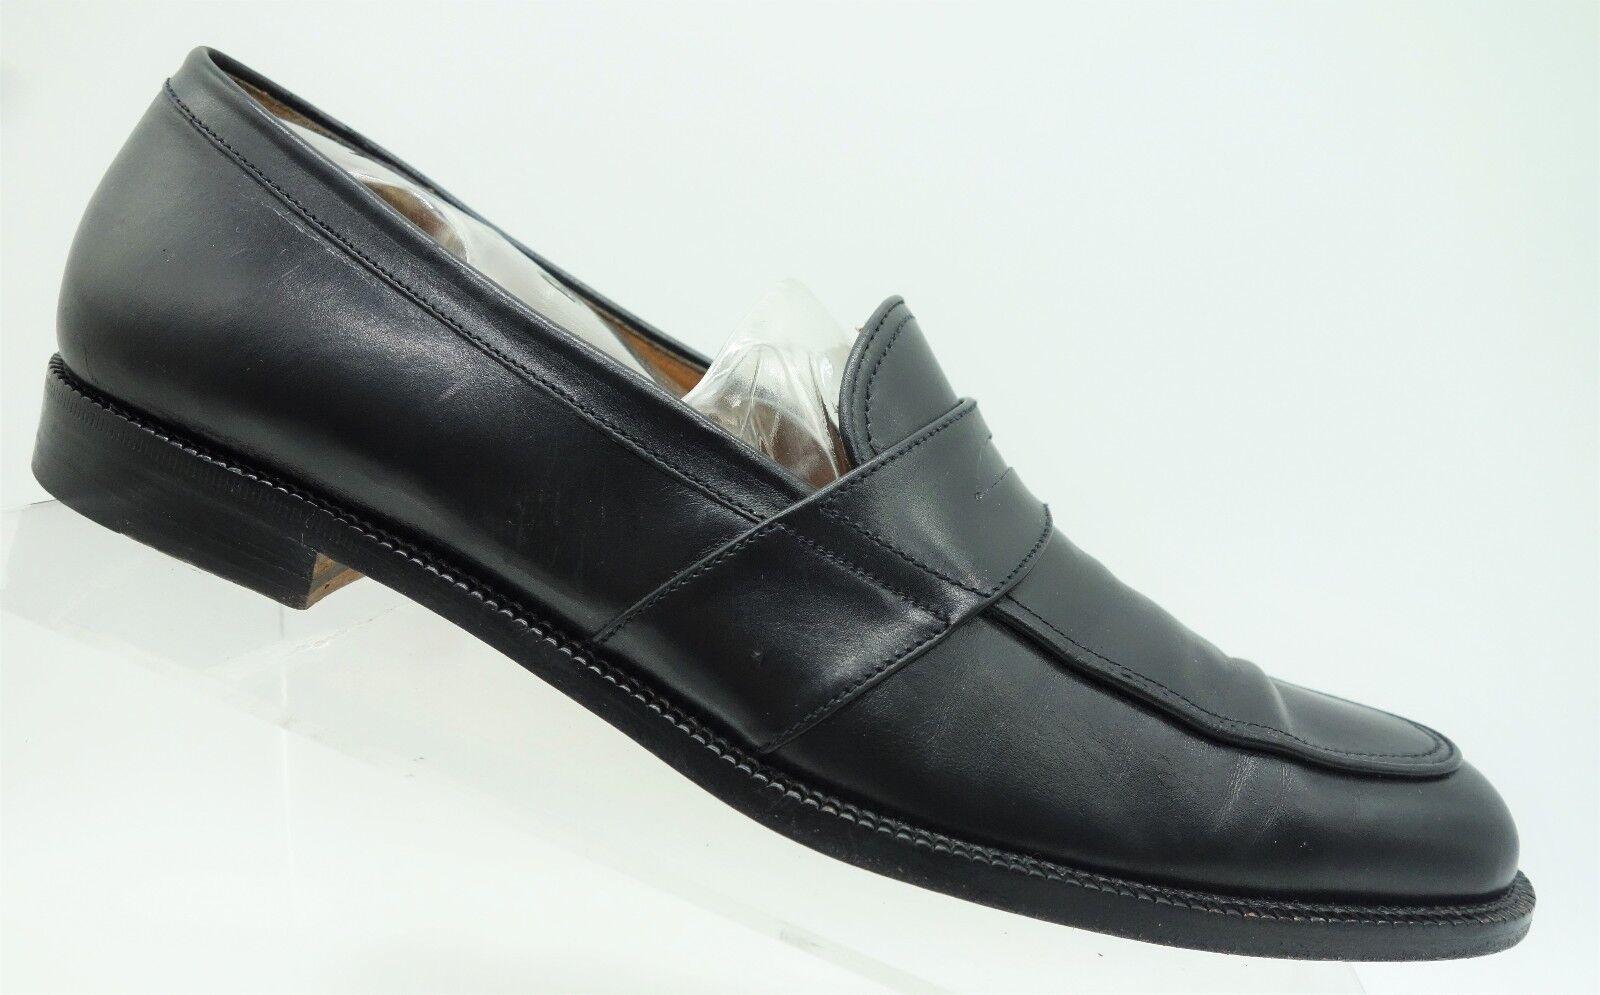 Salvatore Ferragamo Sport  Black Leather Casual Loafer Women's shoes 8 4A